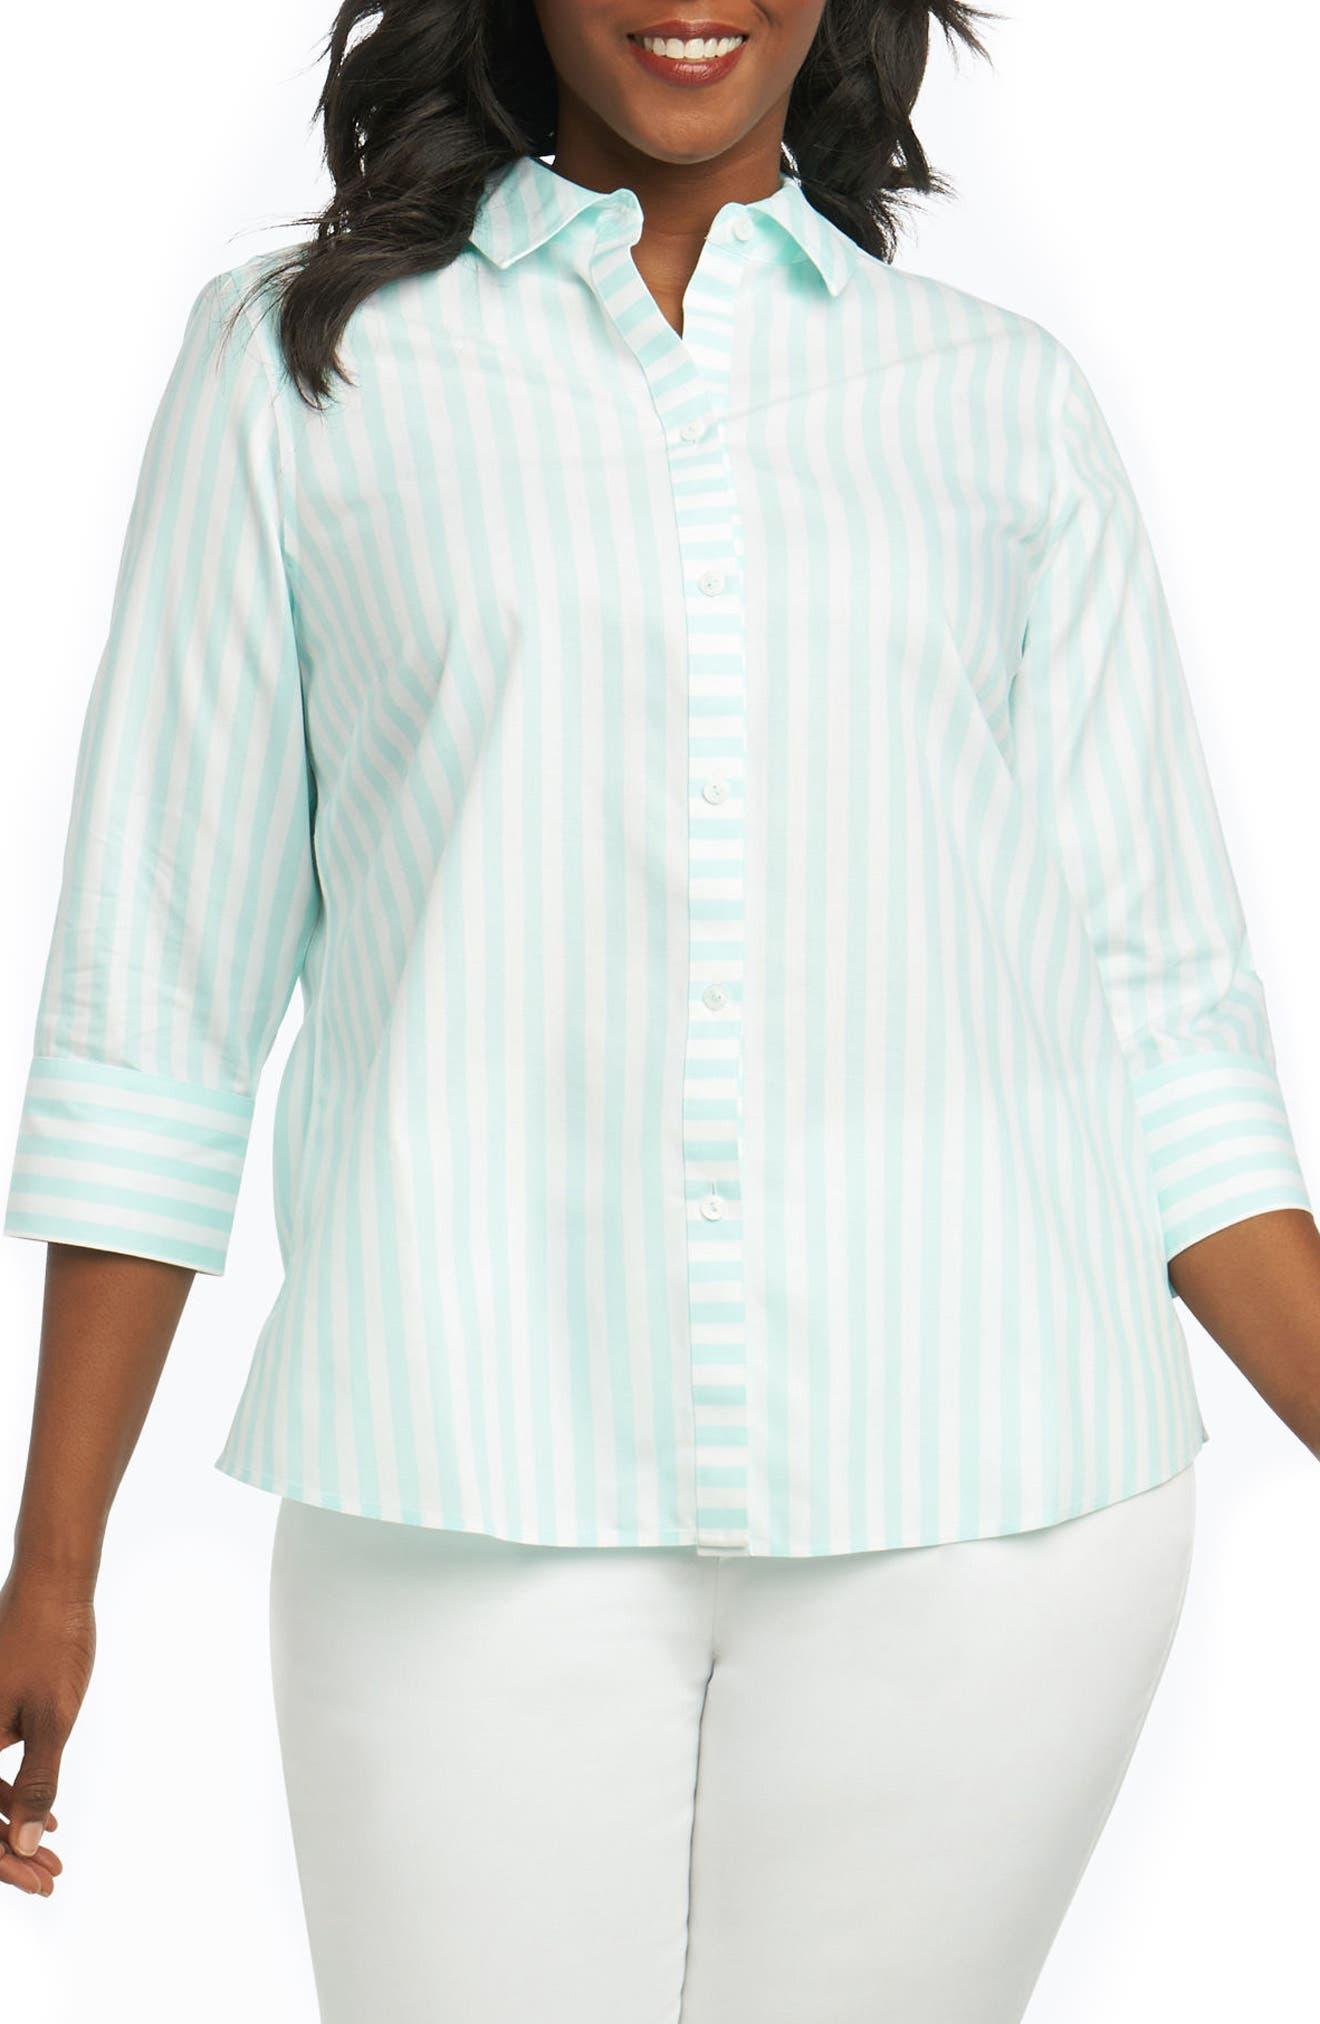 Ava Royal Oxford Stripe Shirt,                         Main,                         color, 455